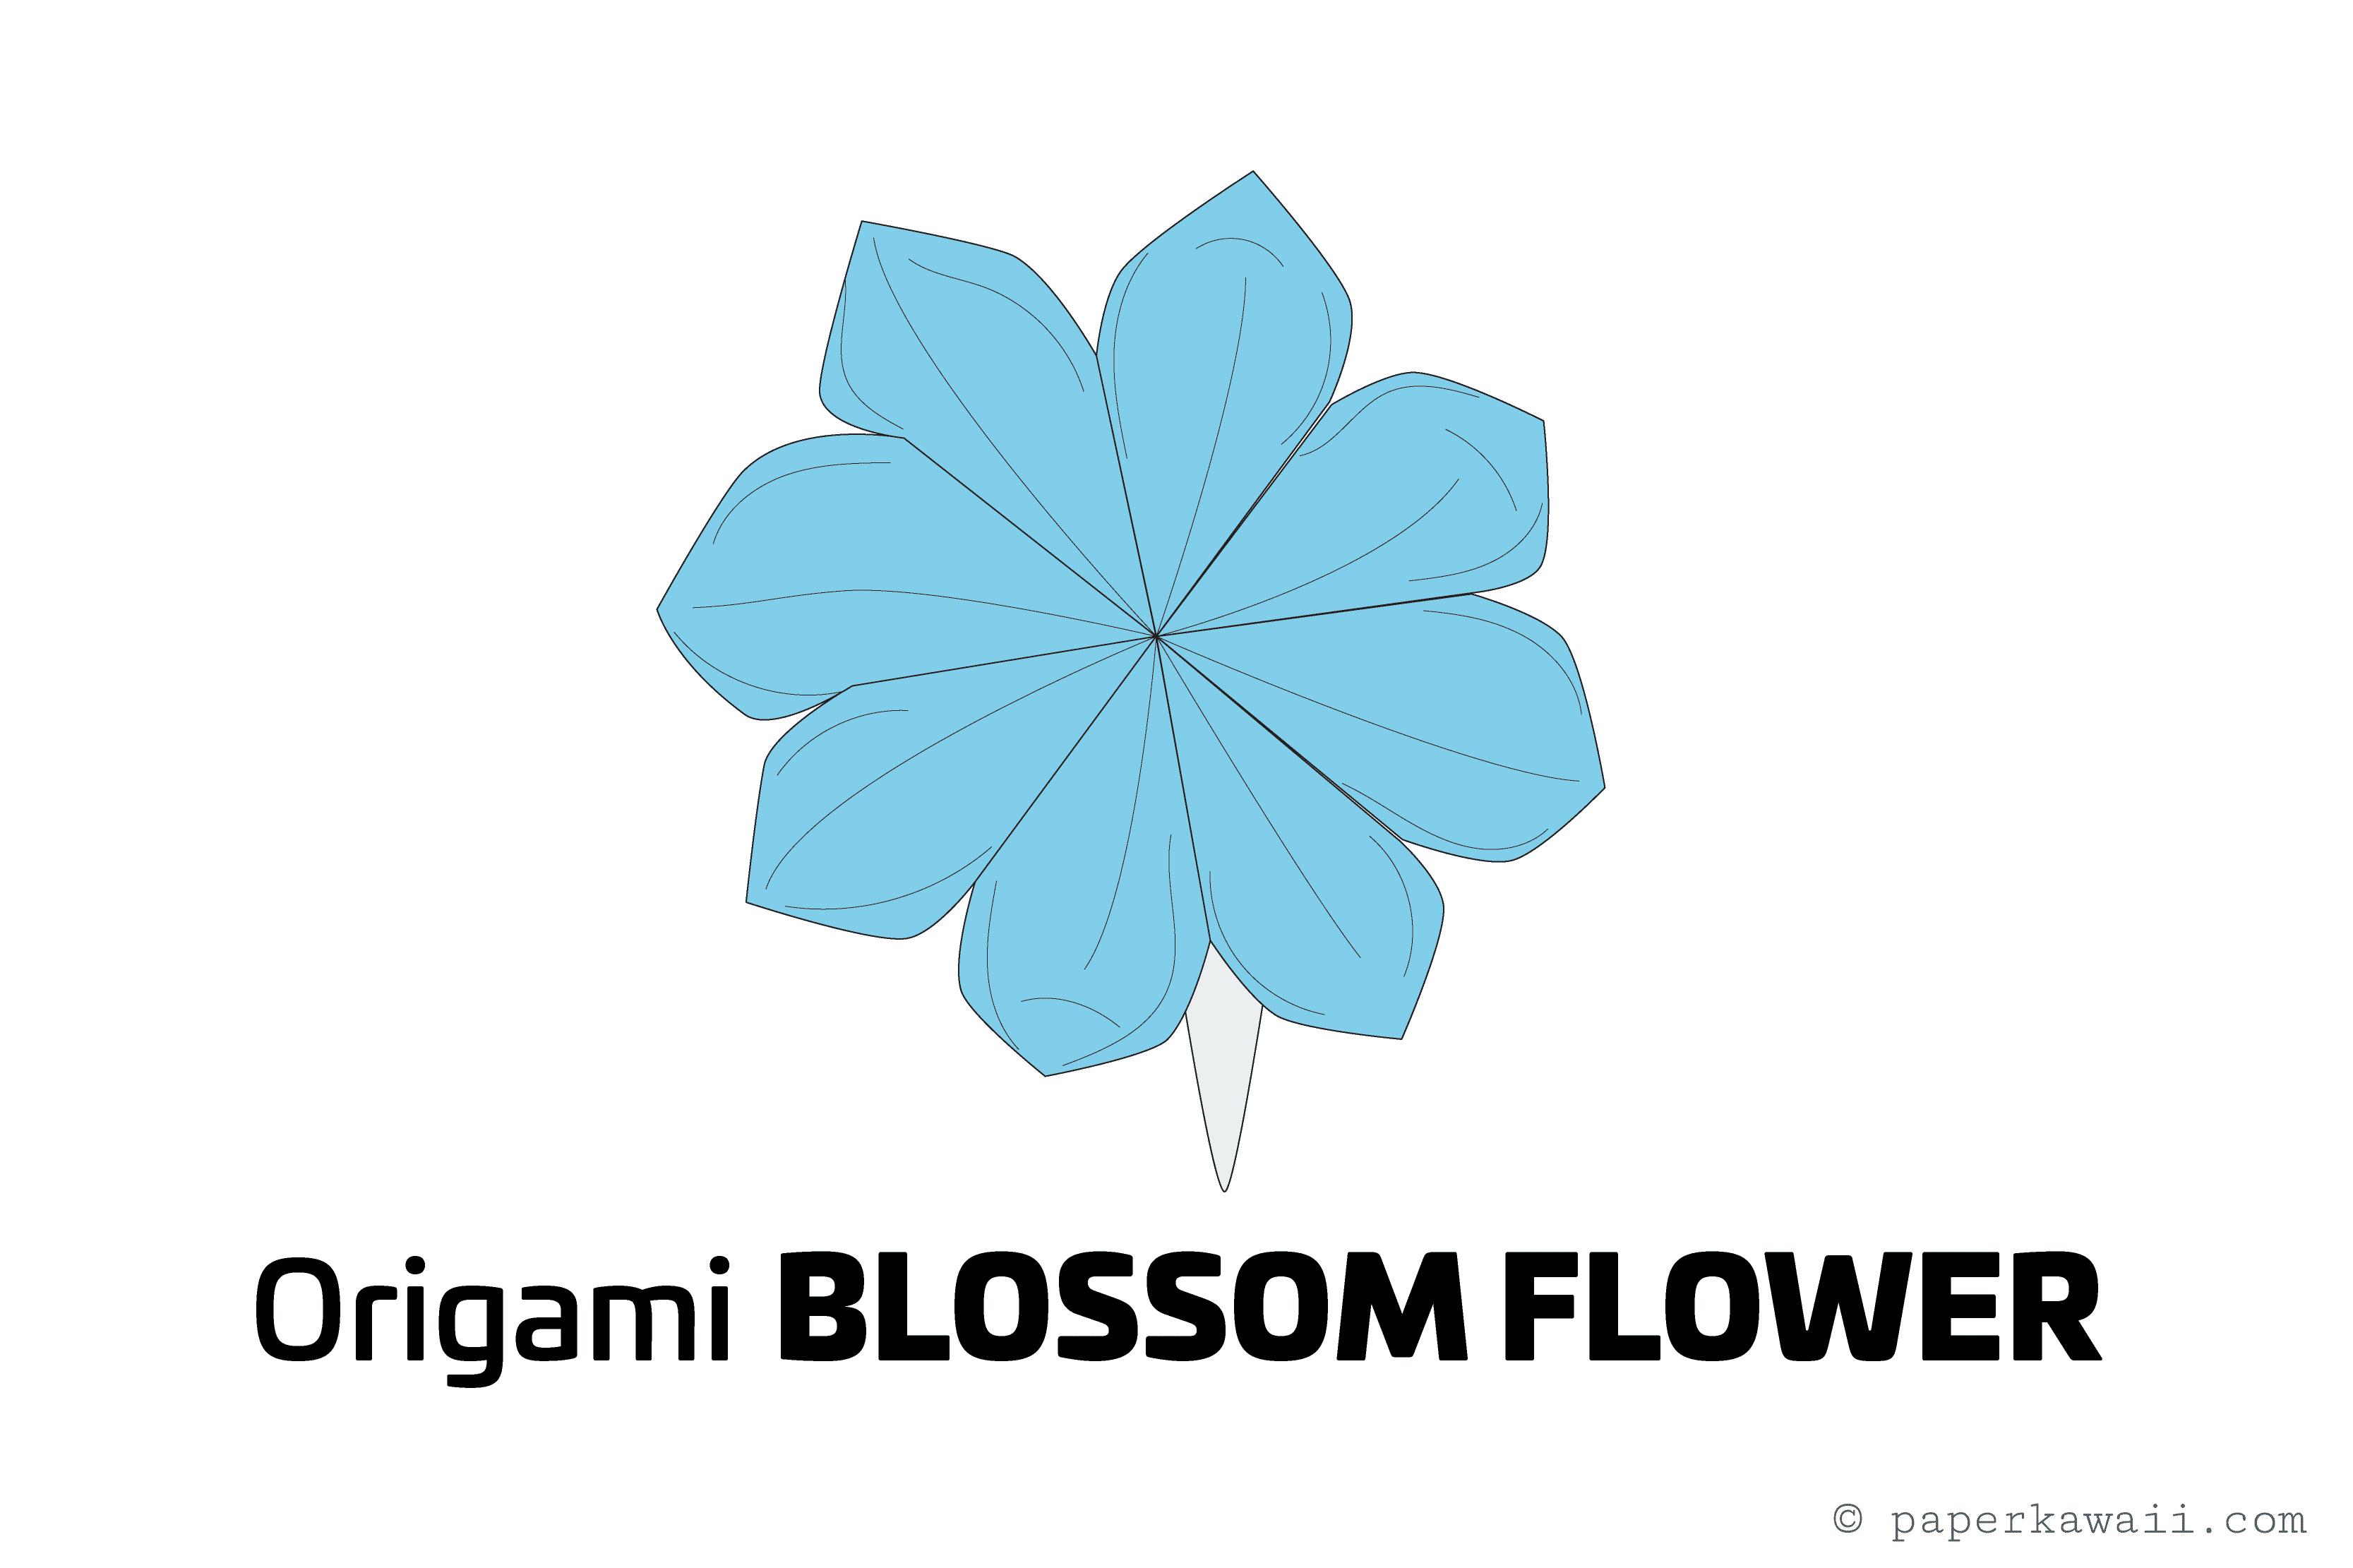 How To Make A Pretty Origami Blossom Flower